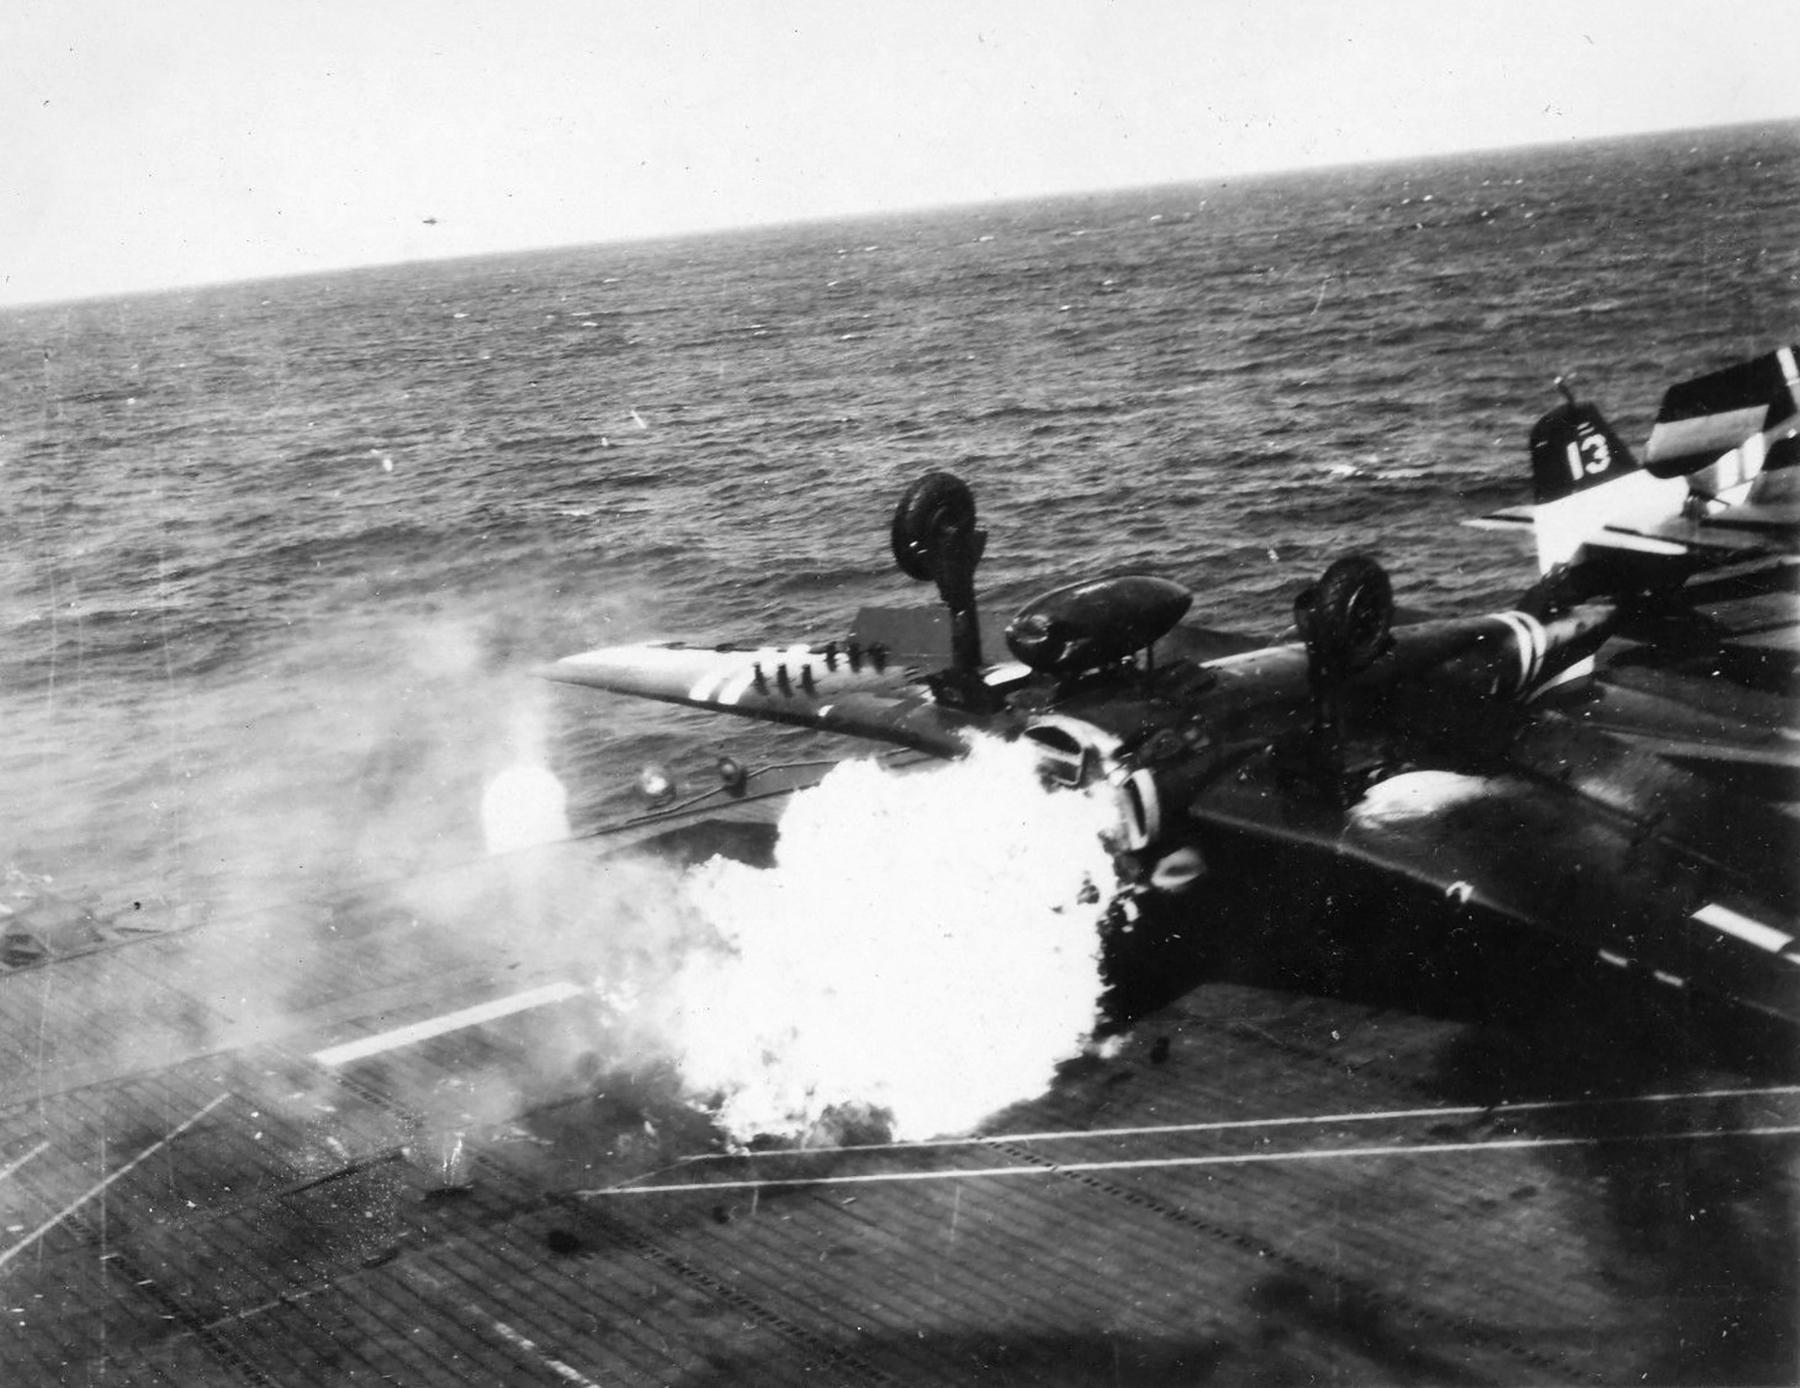 Grumman F6F 5 Hellcat VF 36 White 10 landing mishap CVE 112 USS Siboney Aug 1945 May 1946 03